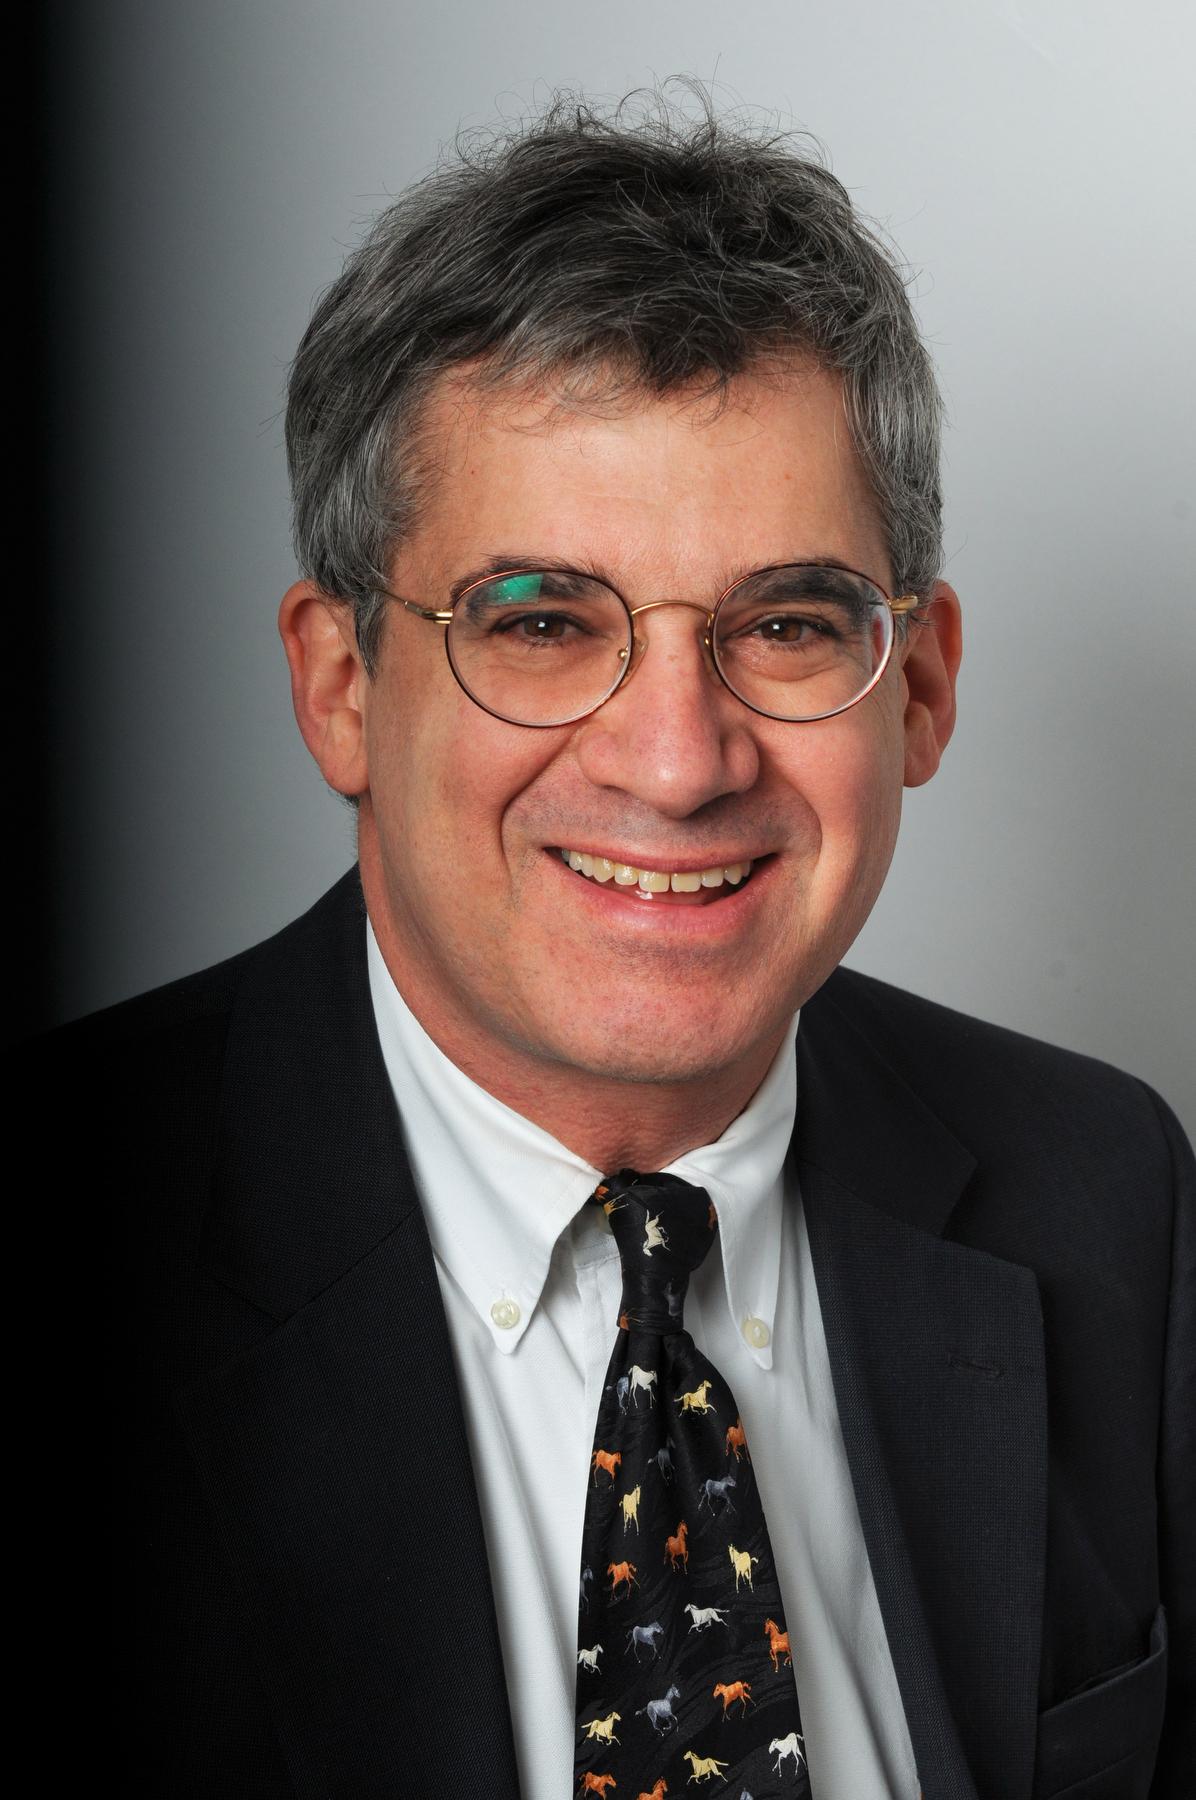 Prof. Josh Lerner